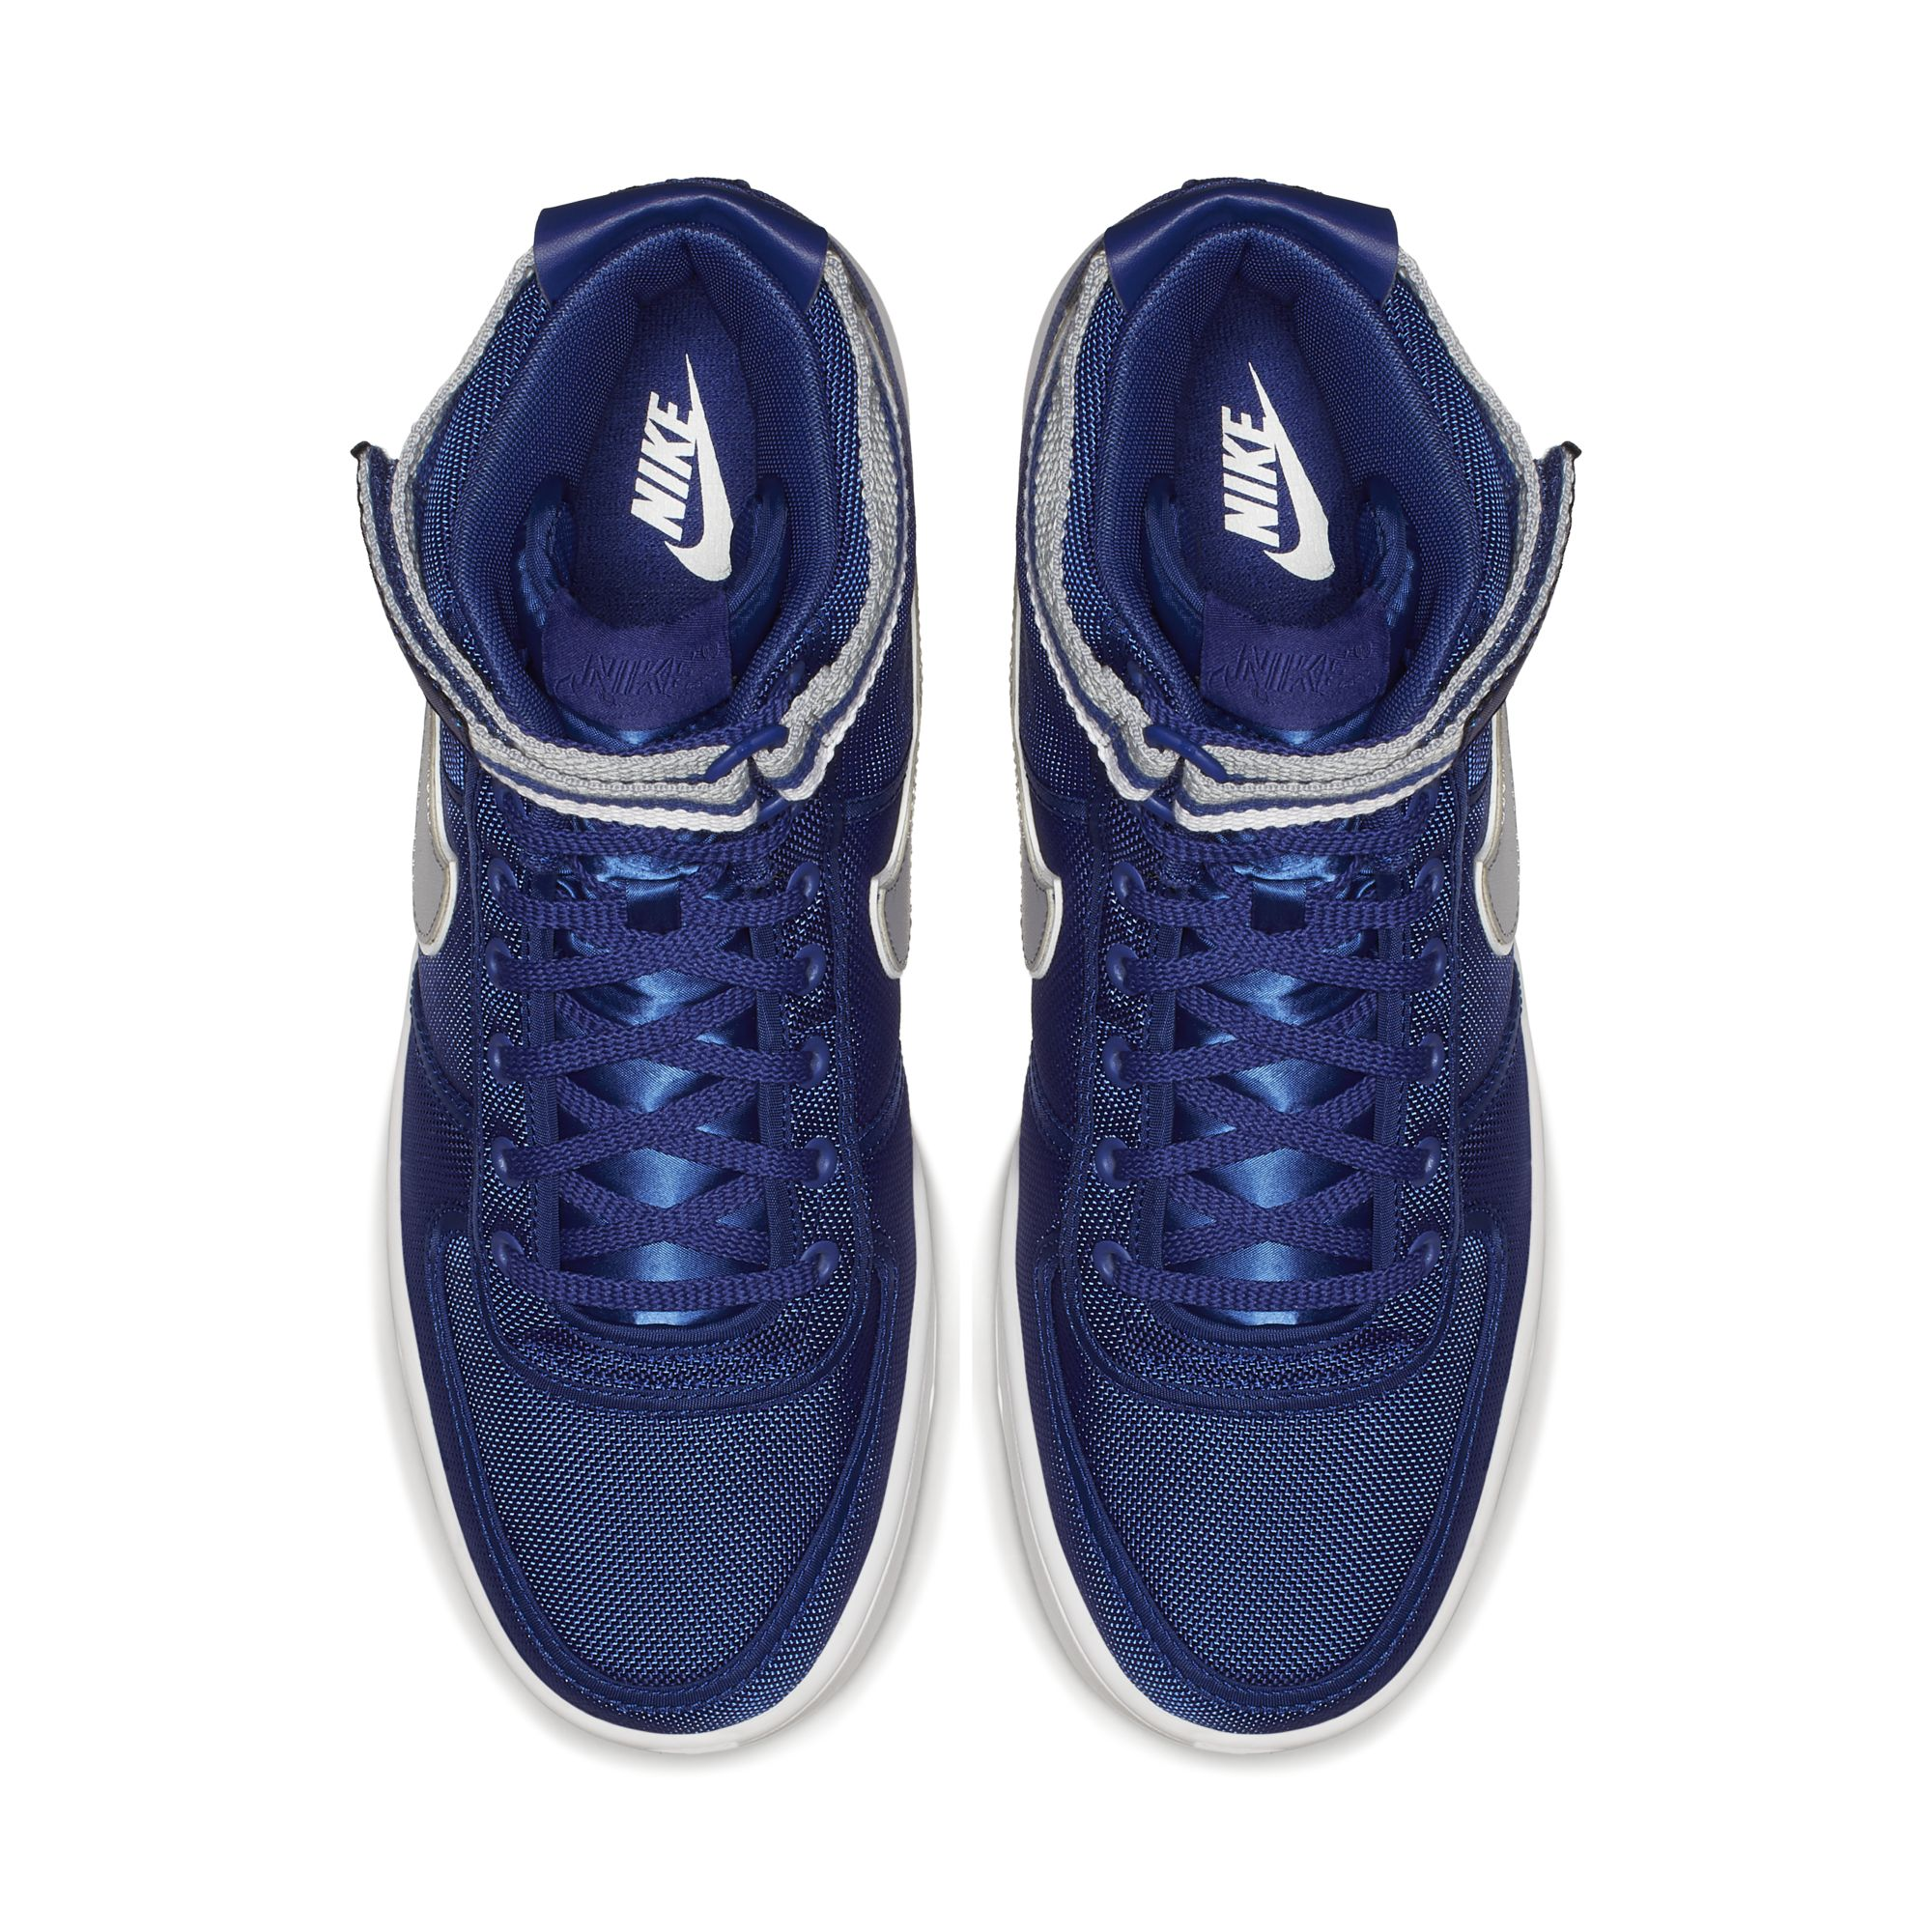 Nike Vandal High Supreme 2